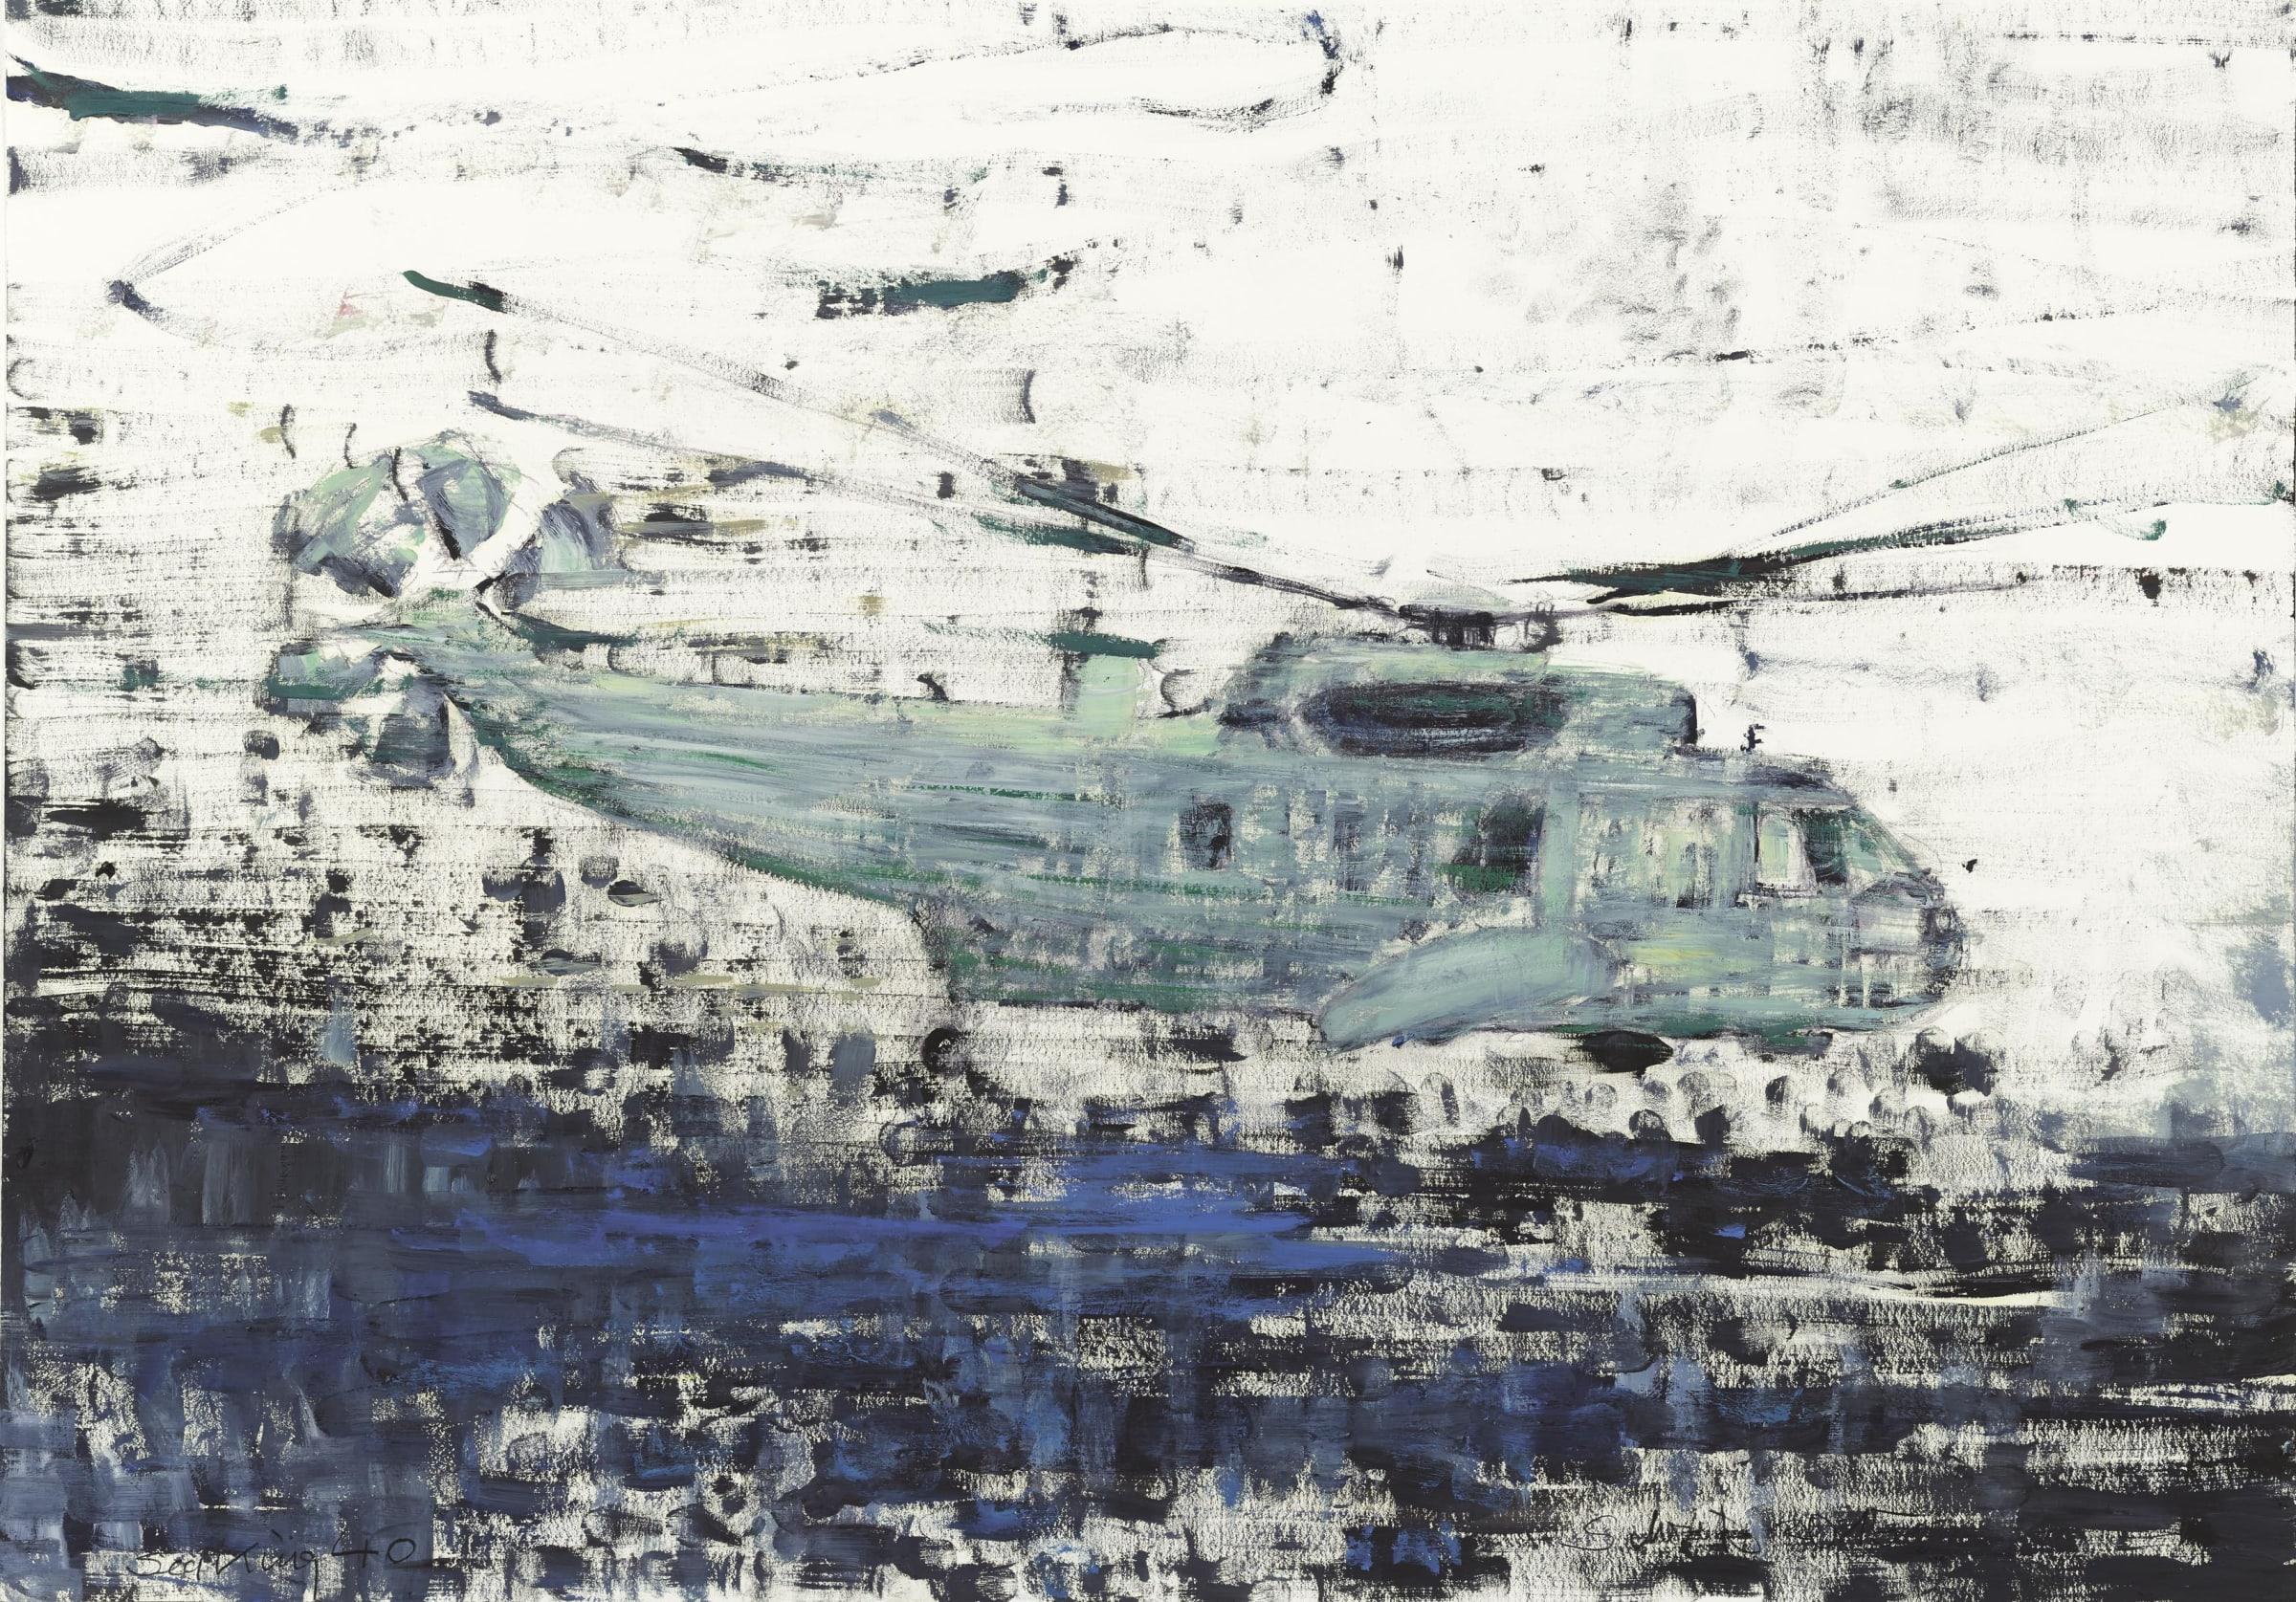 Sabine Moritz, Sea King 40, 2015